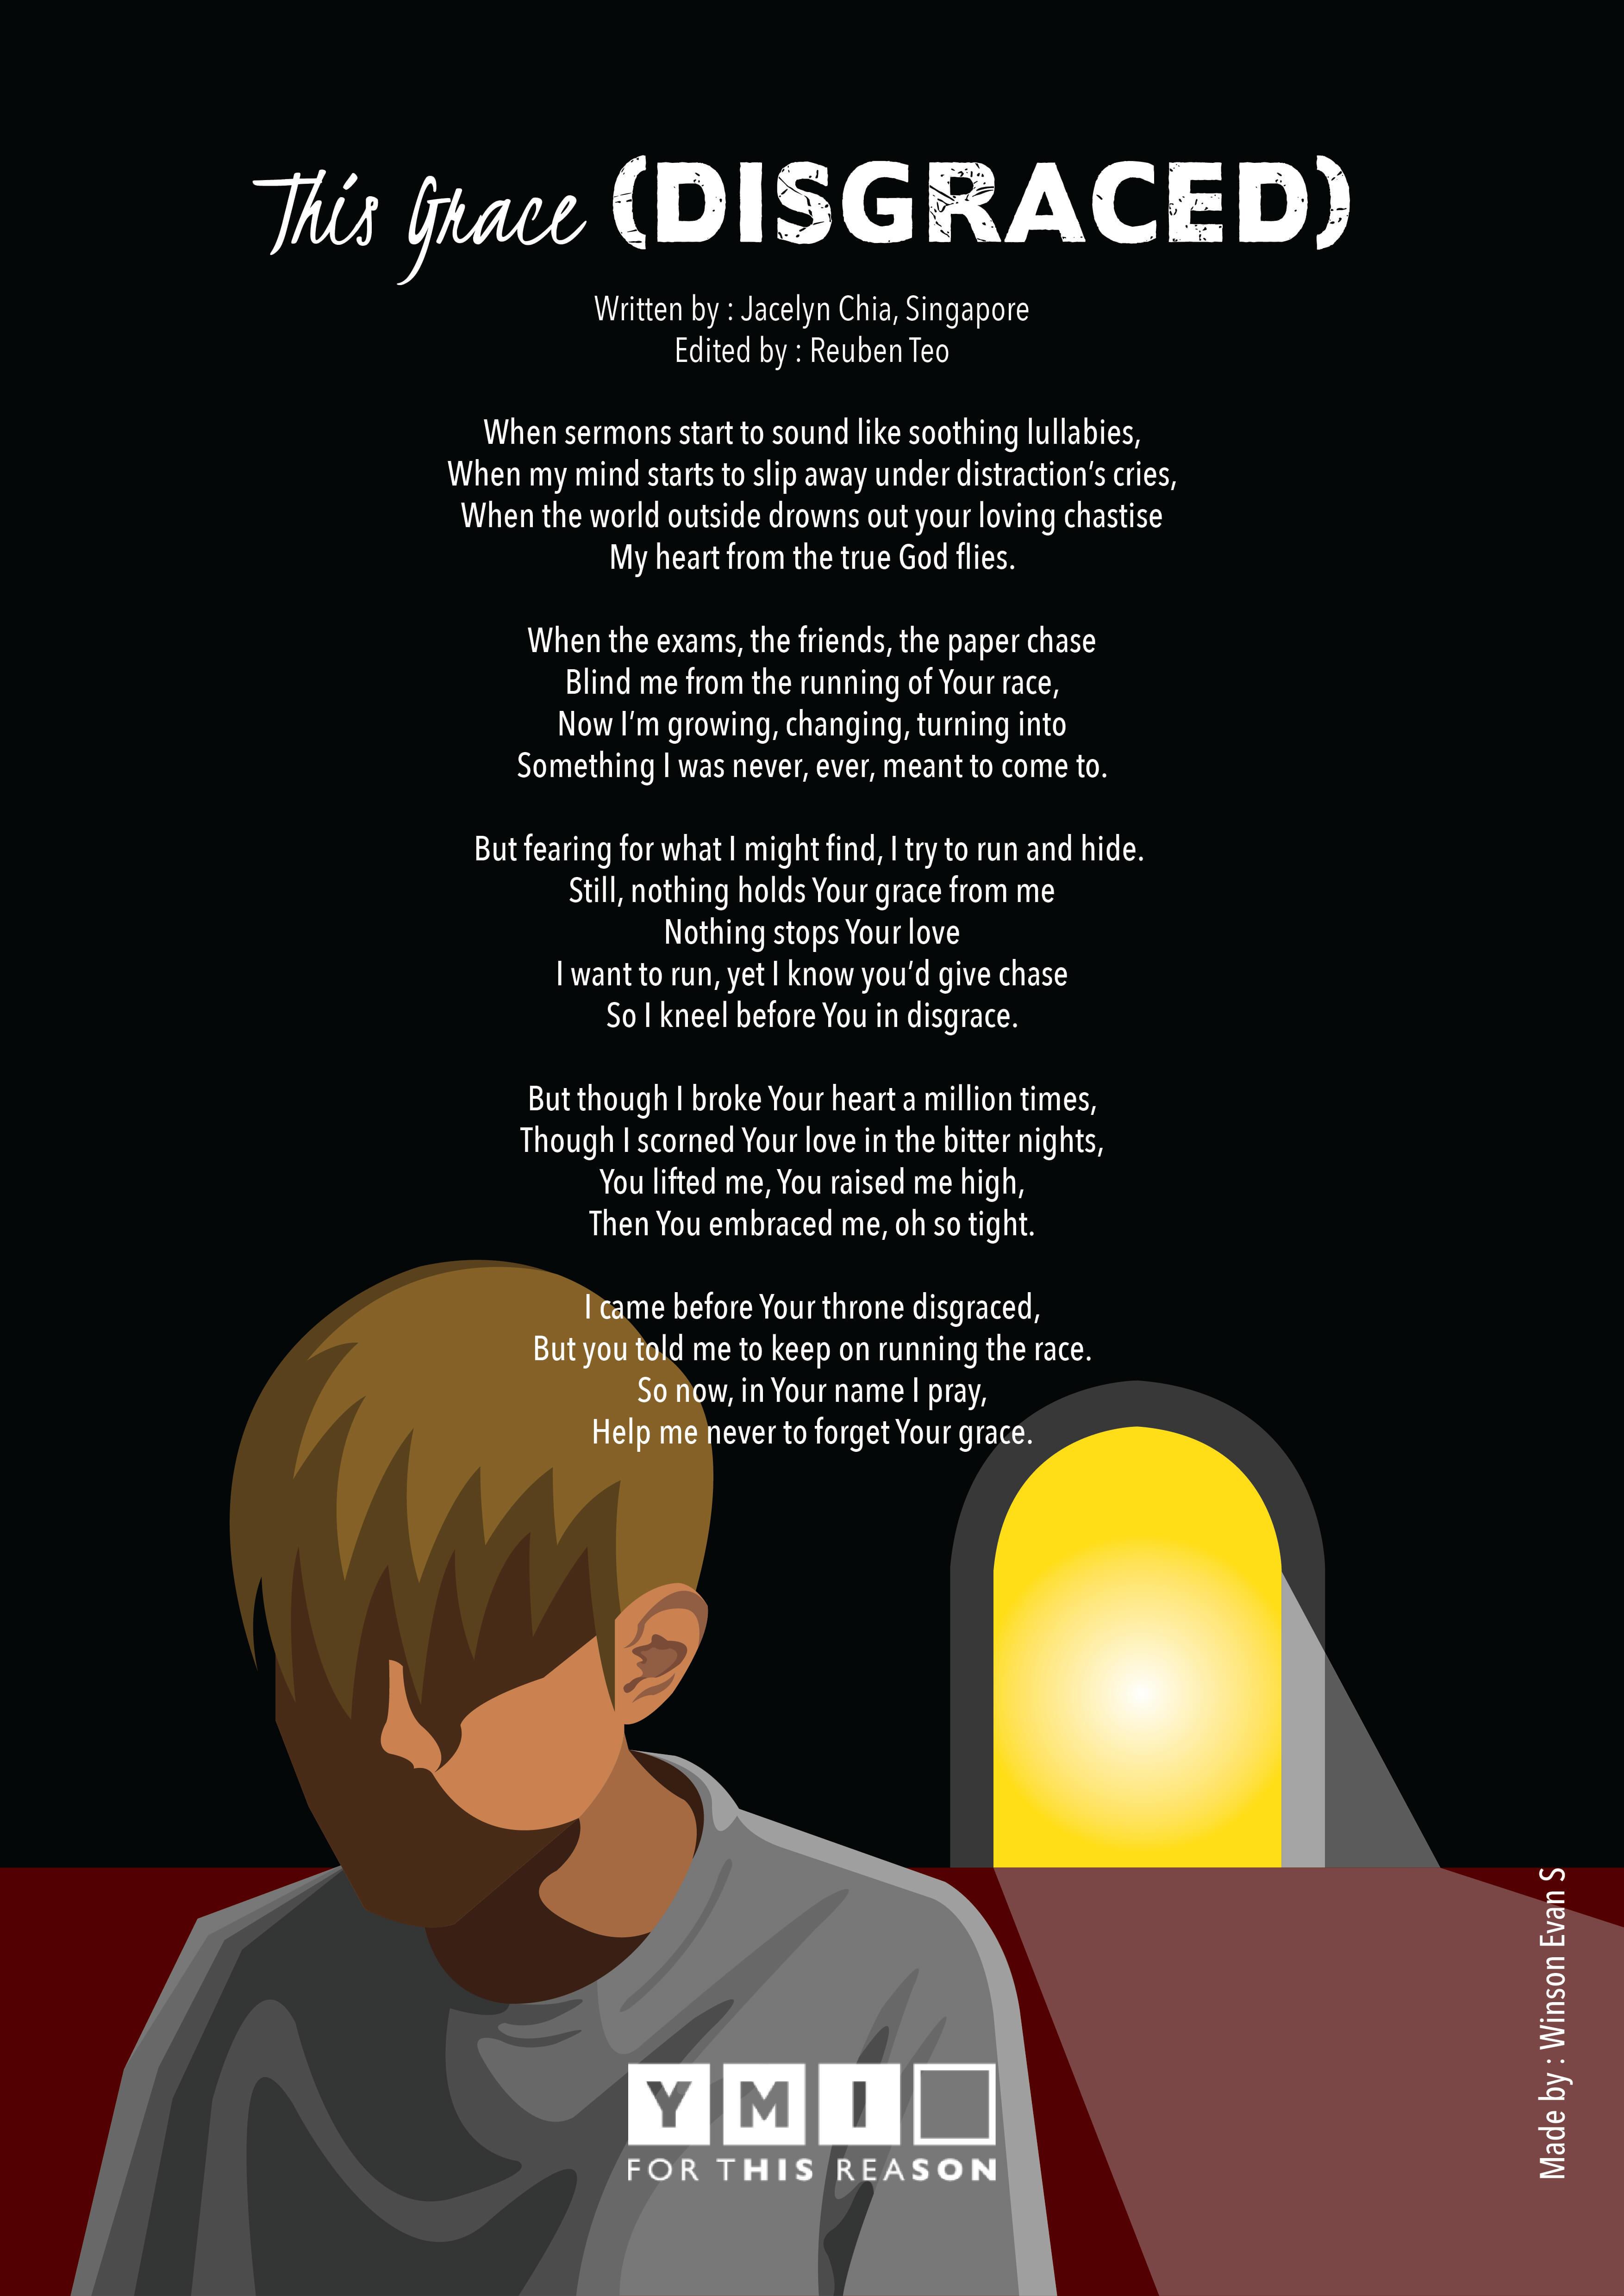 Disgrace poem YMI (1)